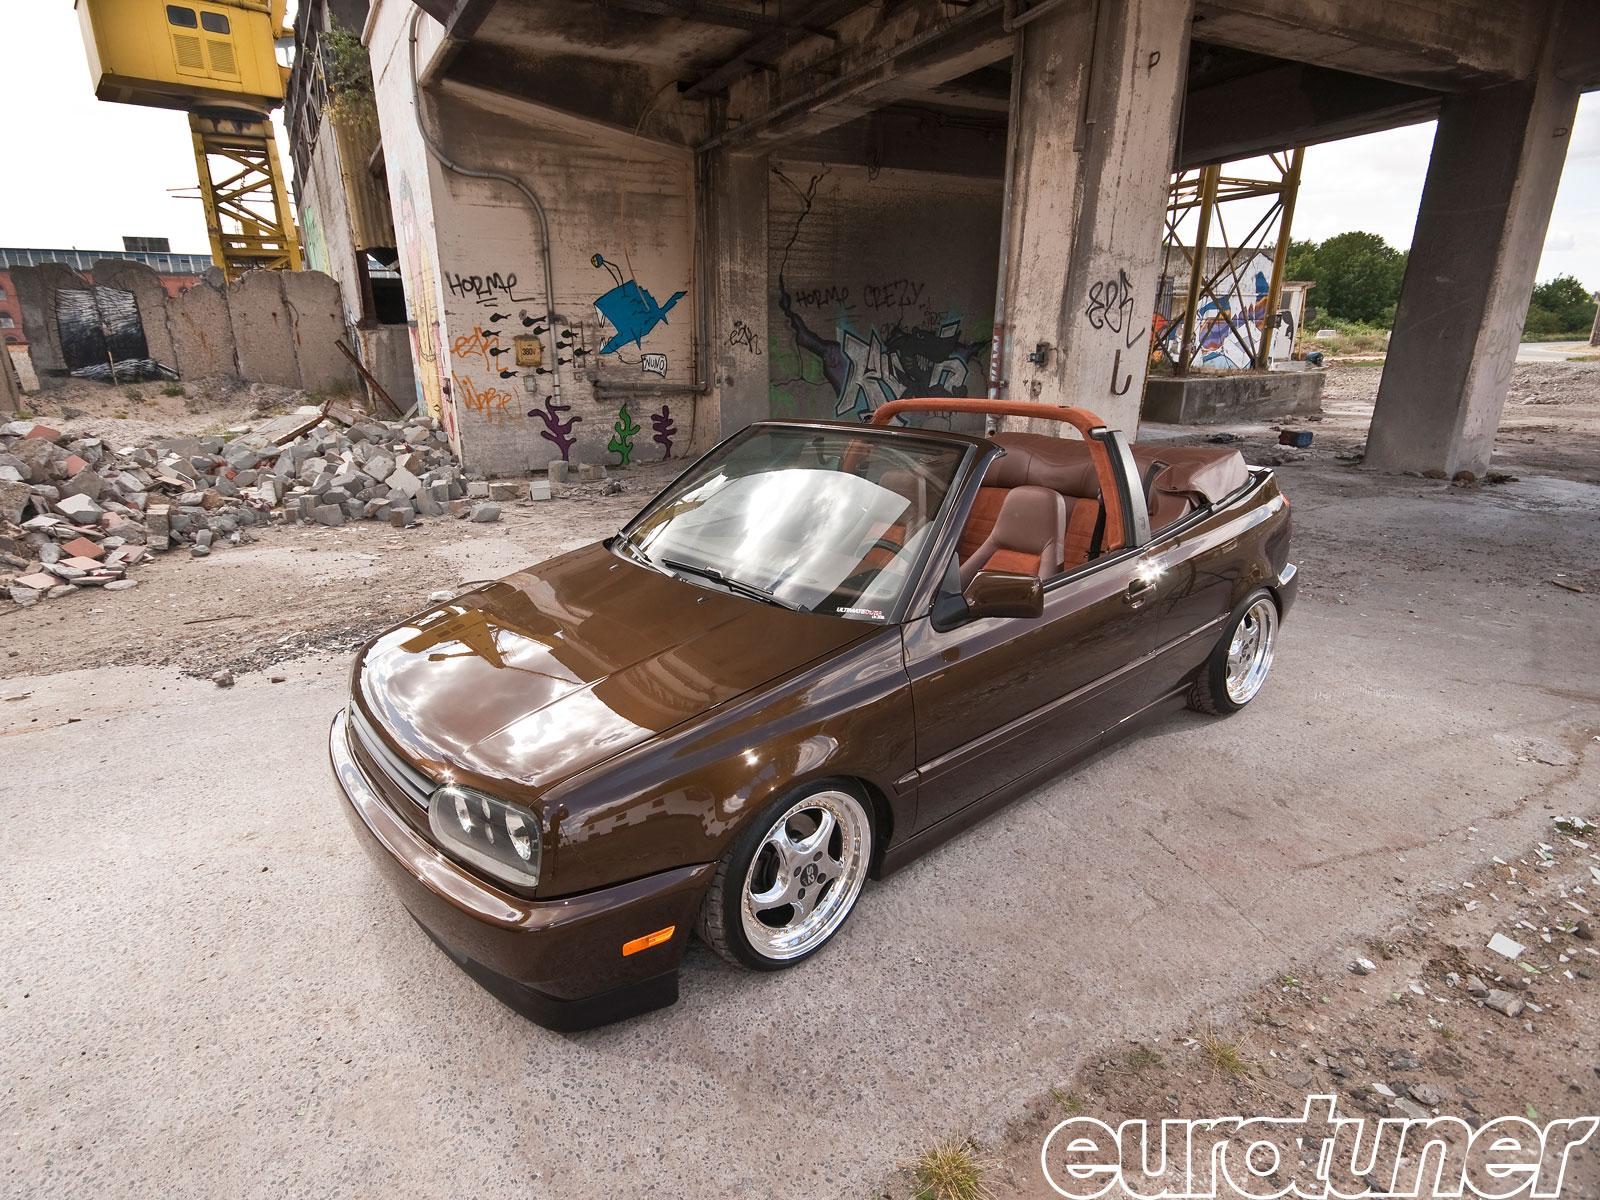 1993 Mk3 Vw Golf Cabriolet Giuseppe Reho S Brown Vision